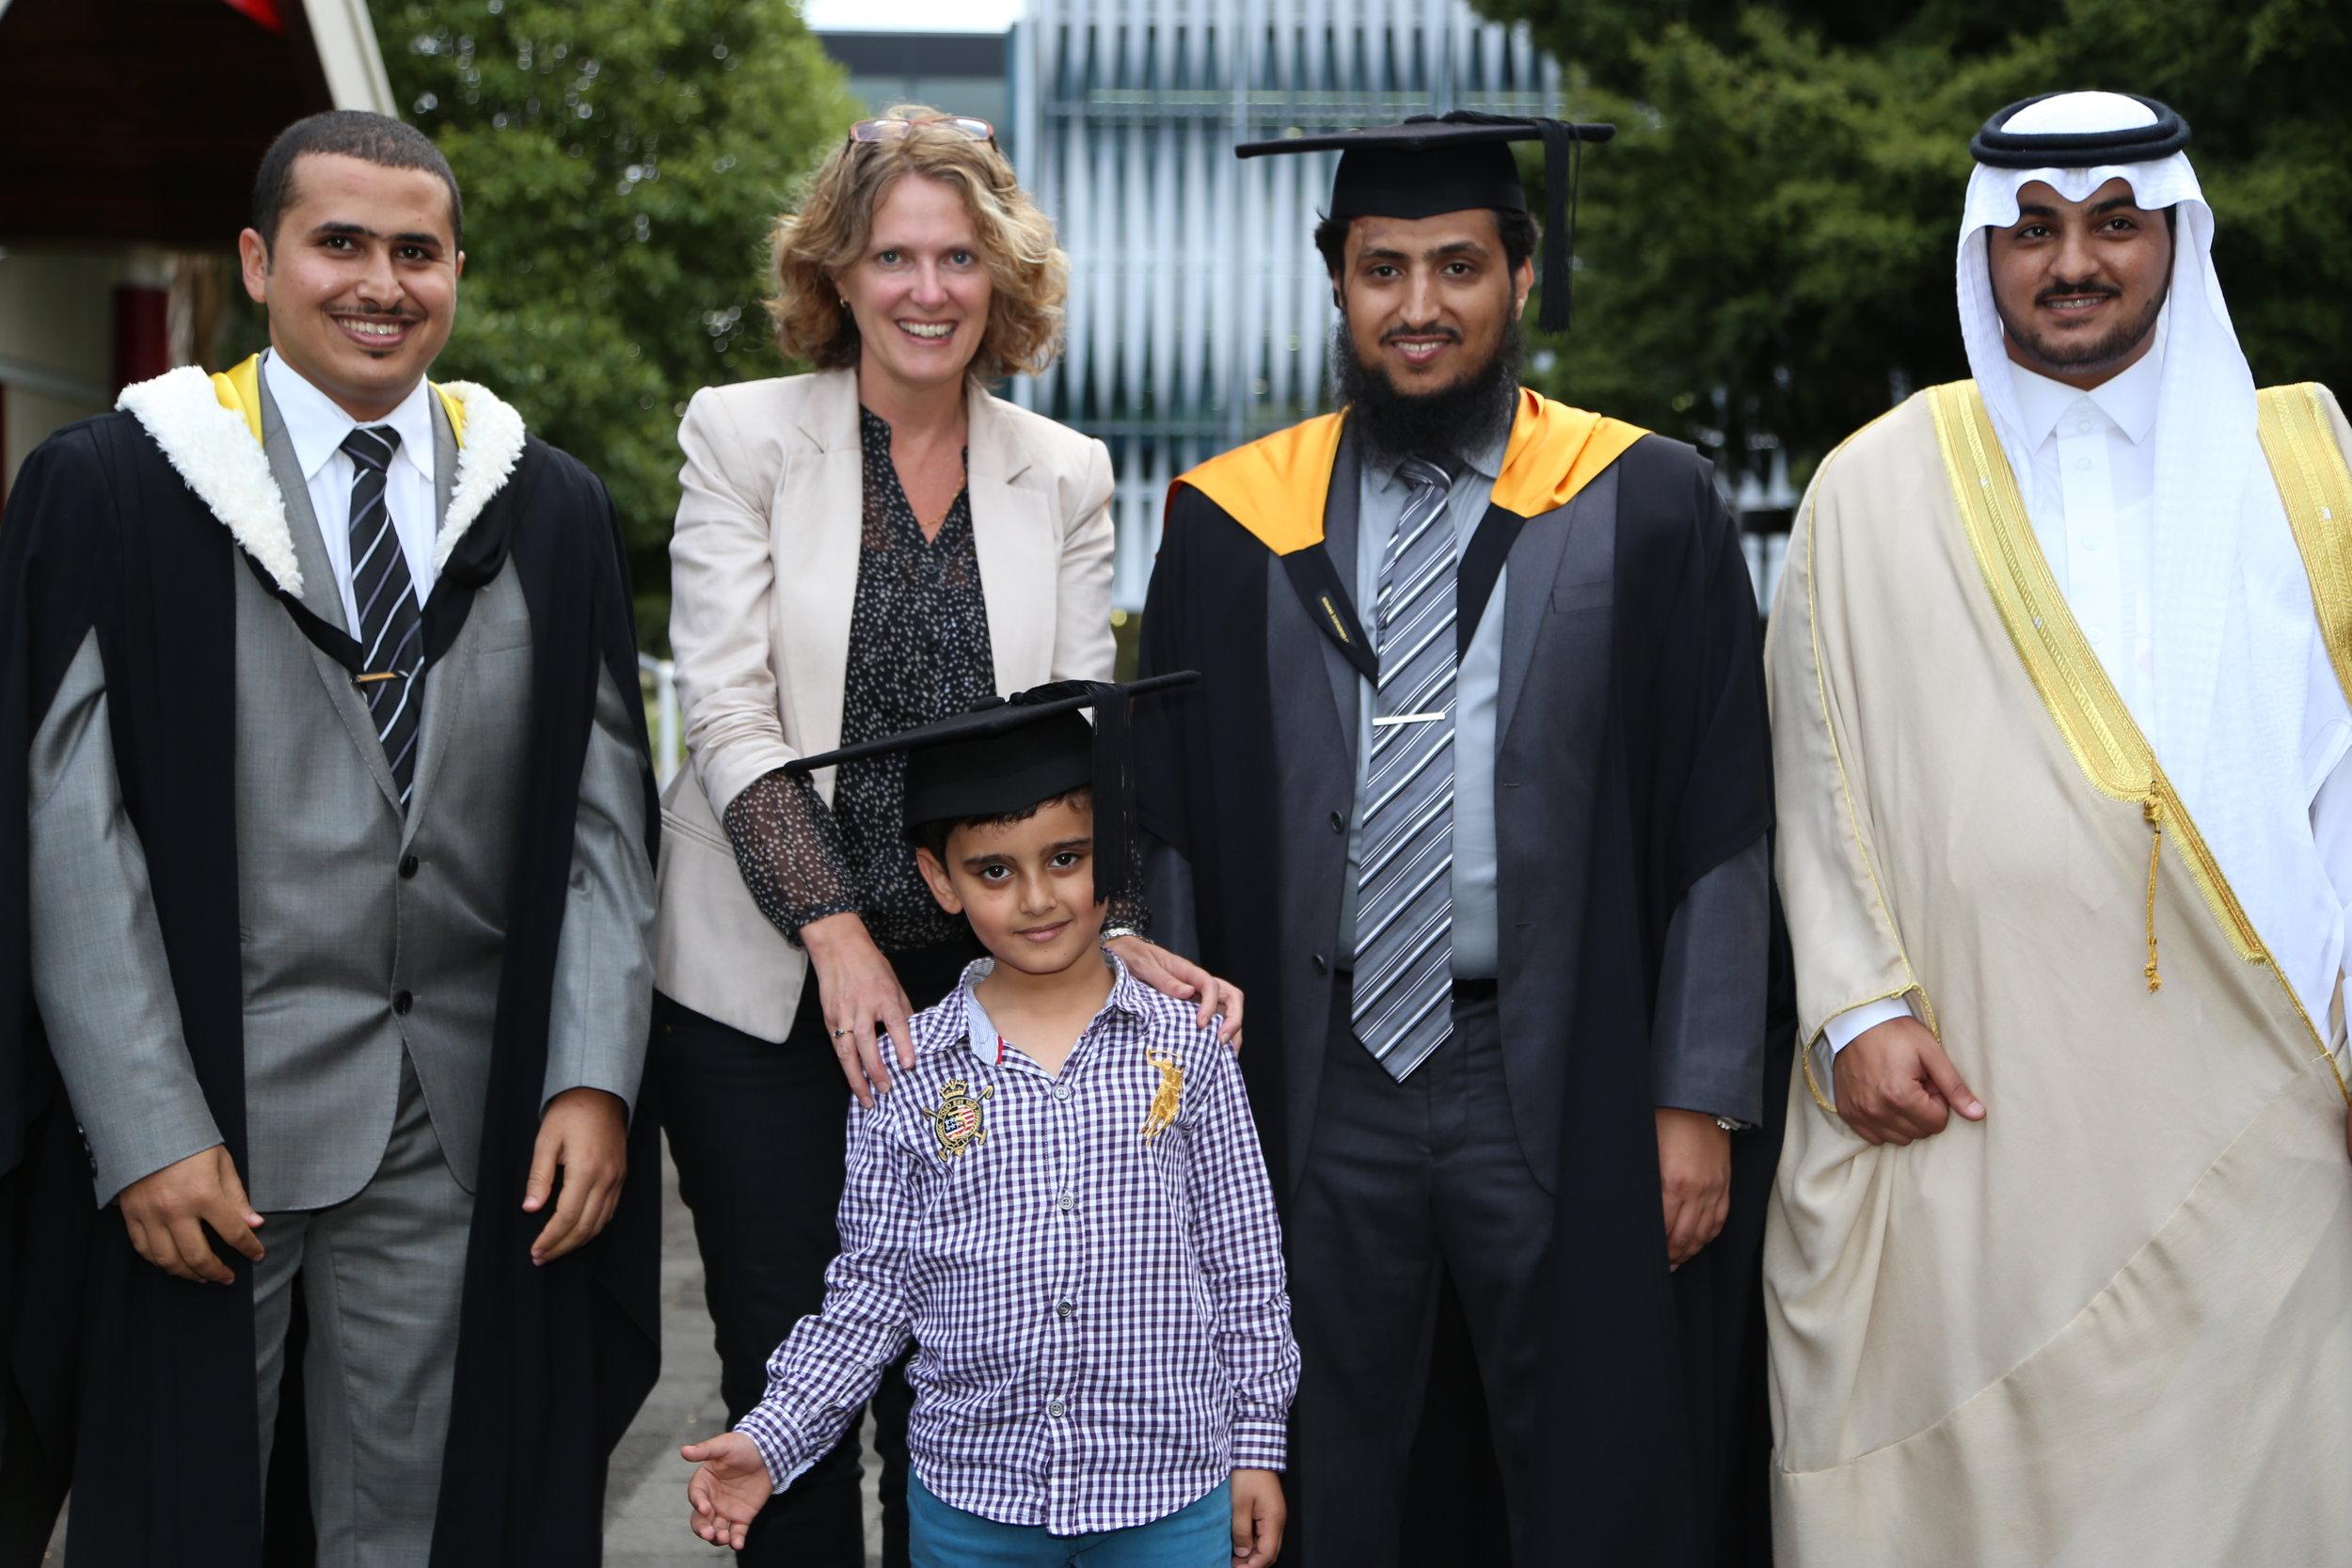 Graduation pic April 2013.jpg